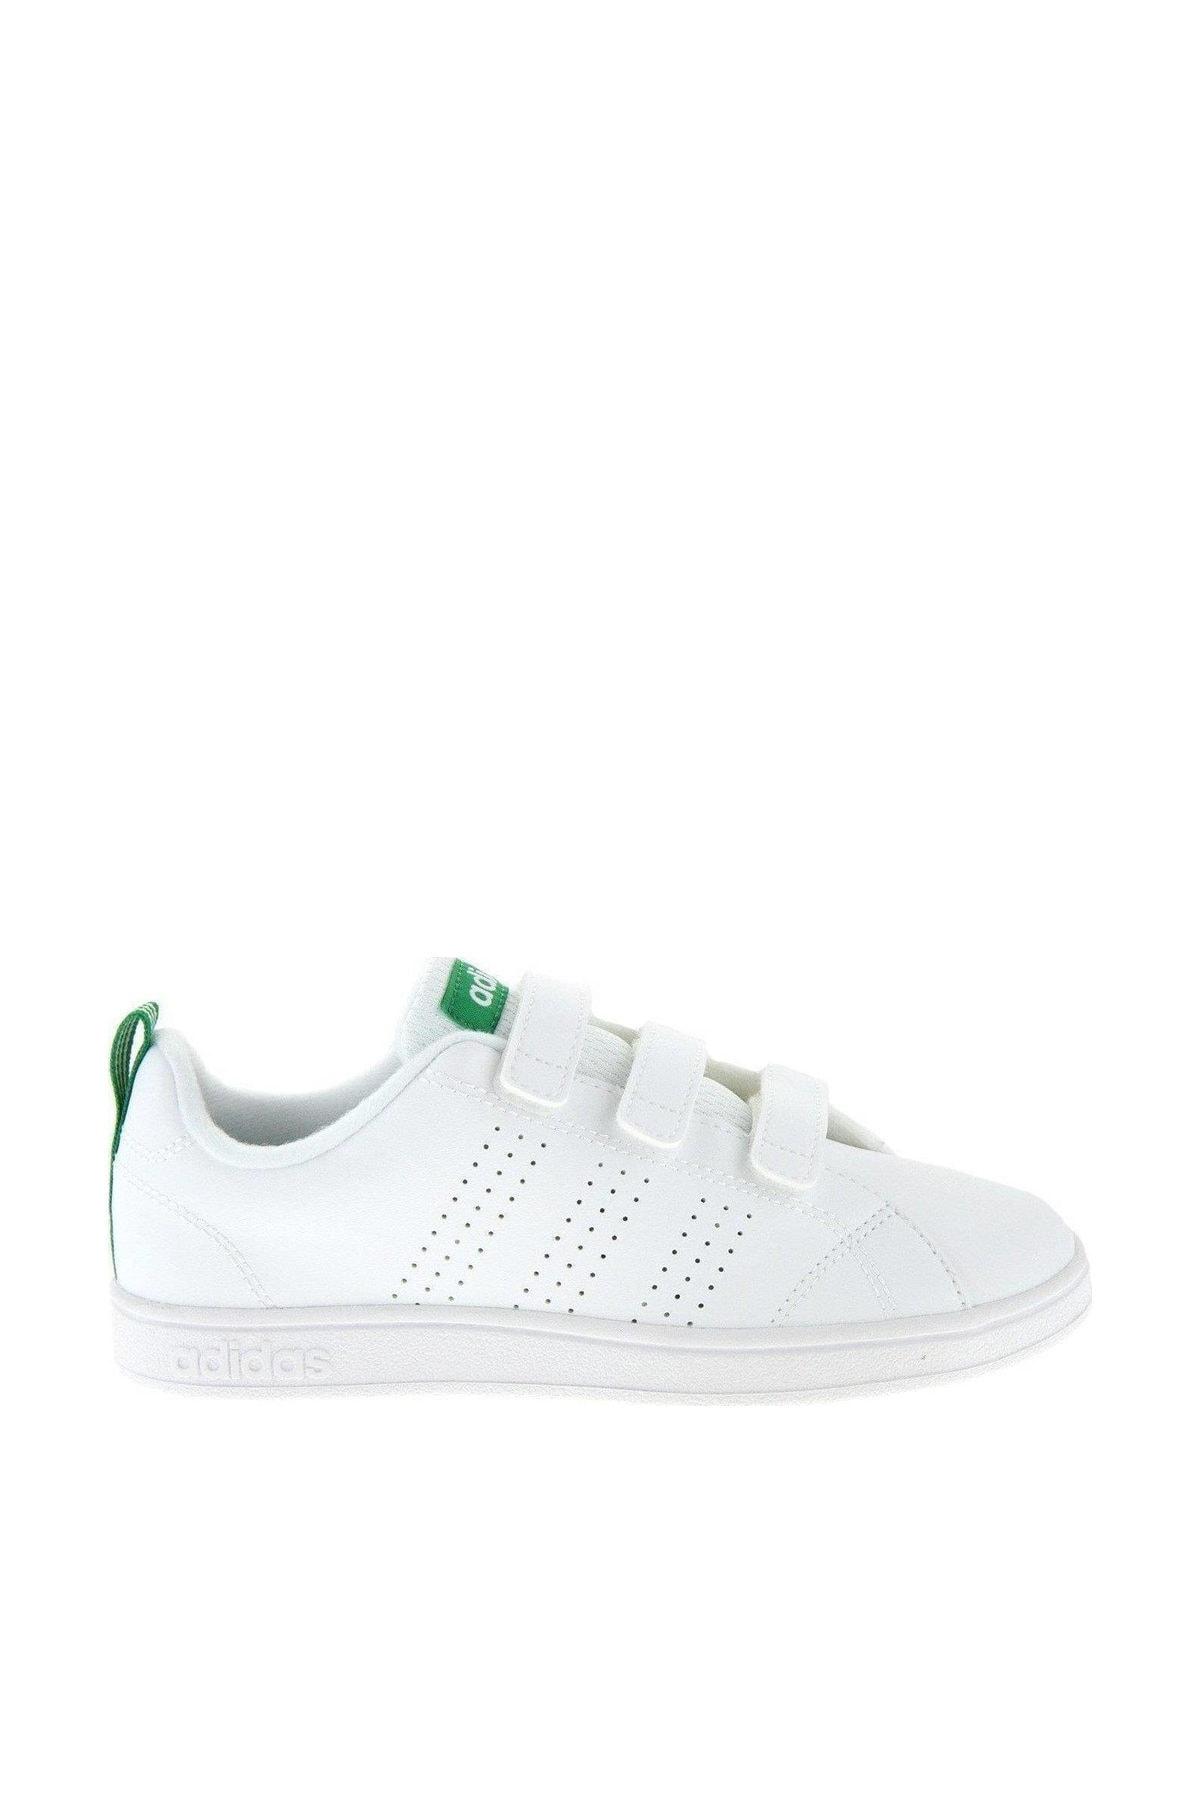 adidas VS ADVANTAGE CLEAN CMF C Beyaz Yeşil Erkek Çocuk Sneaker 100260397 1